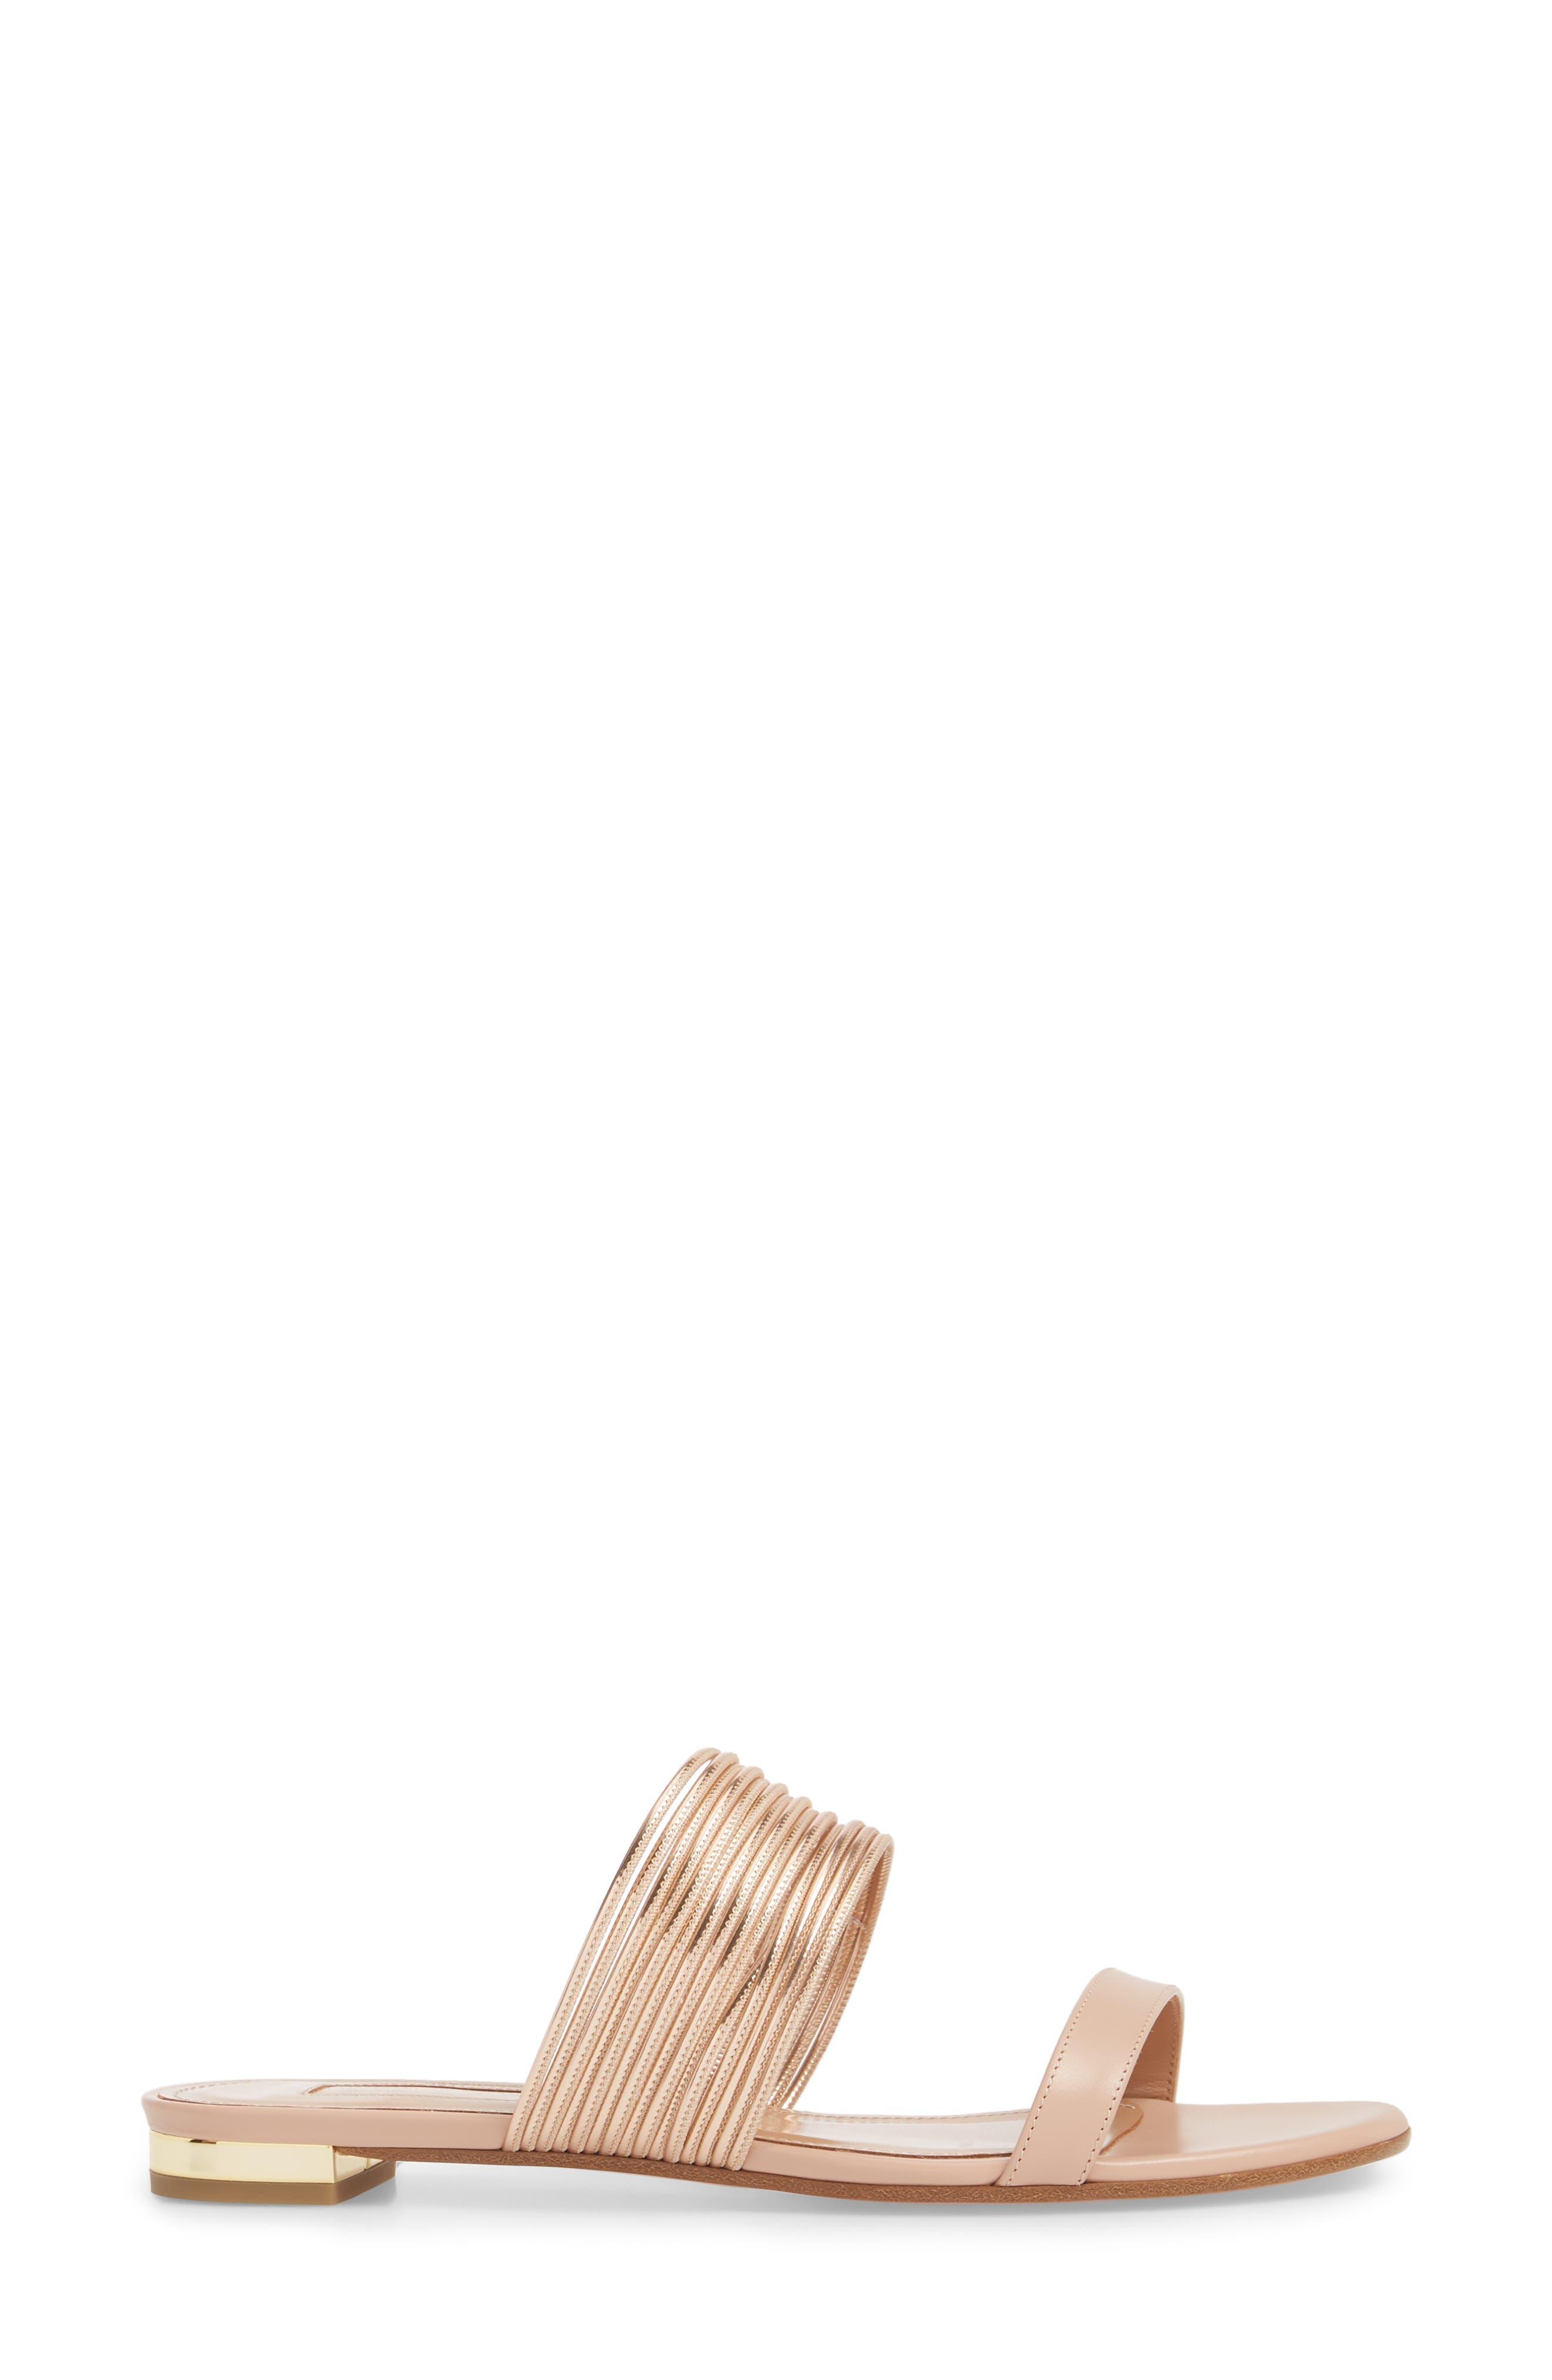 Rendezvous Metallic Sandal,                             Alternate thumbnail 3, color,                             POWDER PINK/CIPRIA